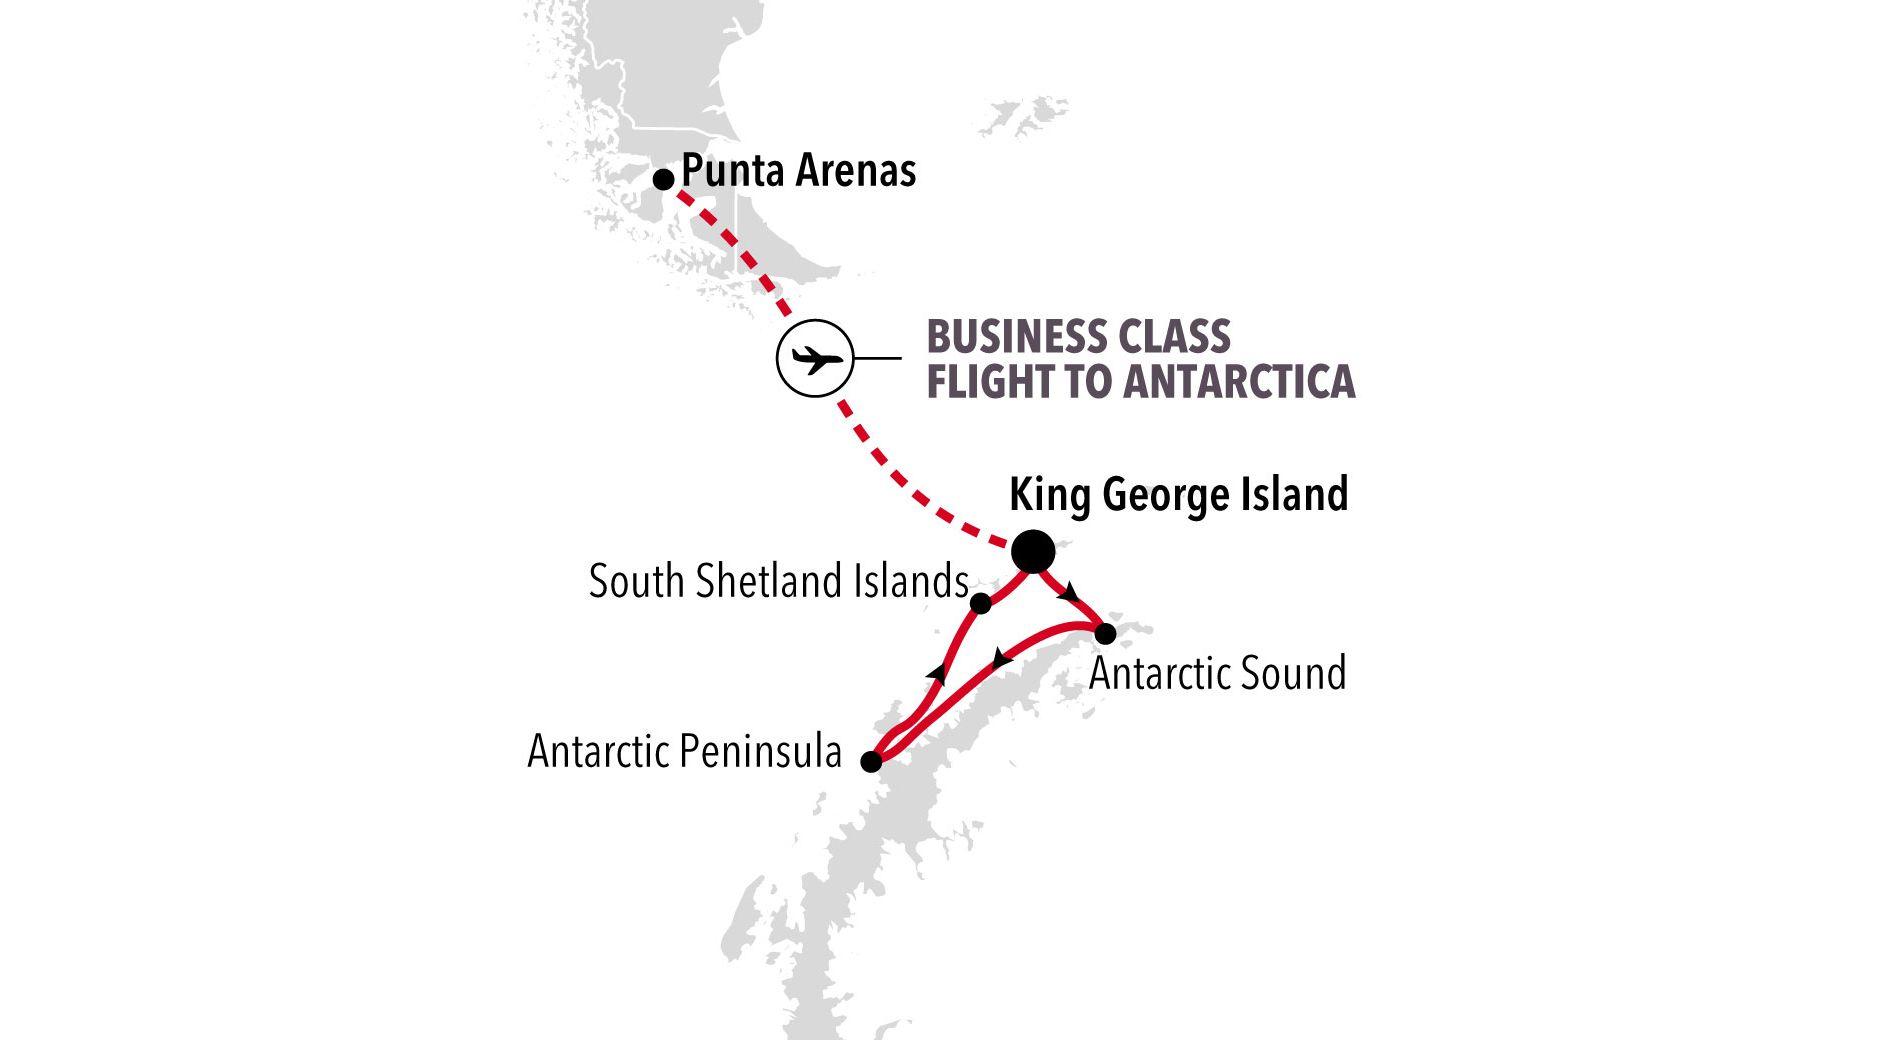 E1220317006 - King George Island to King George Island